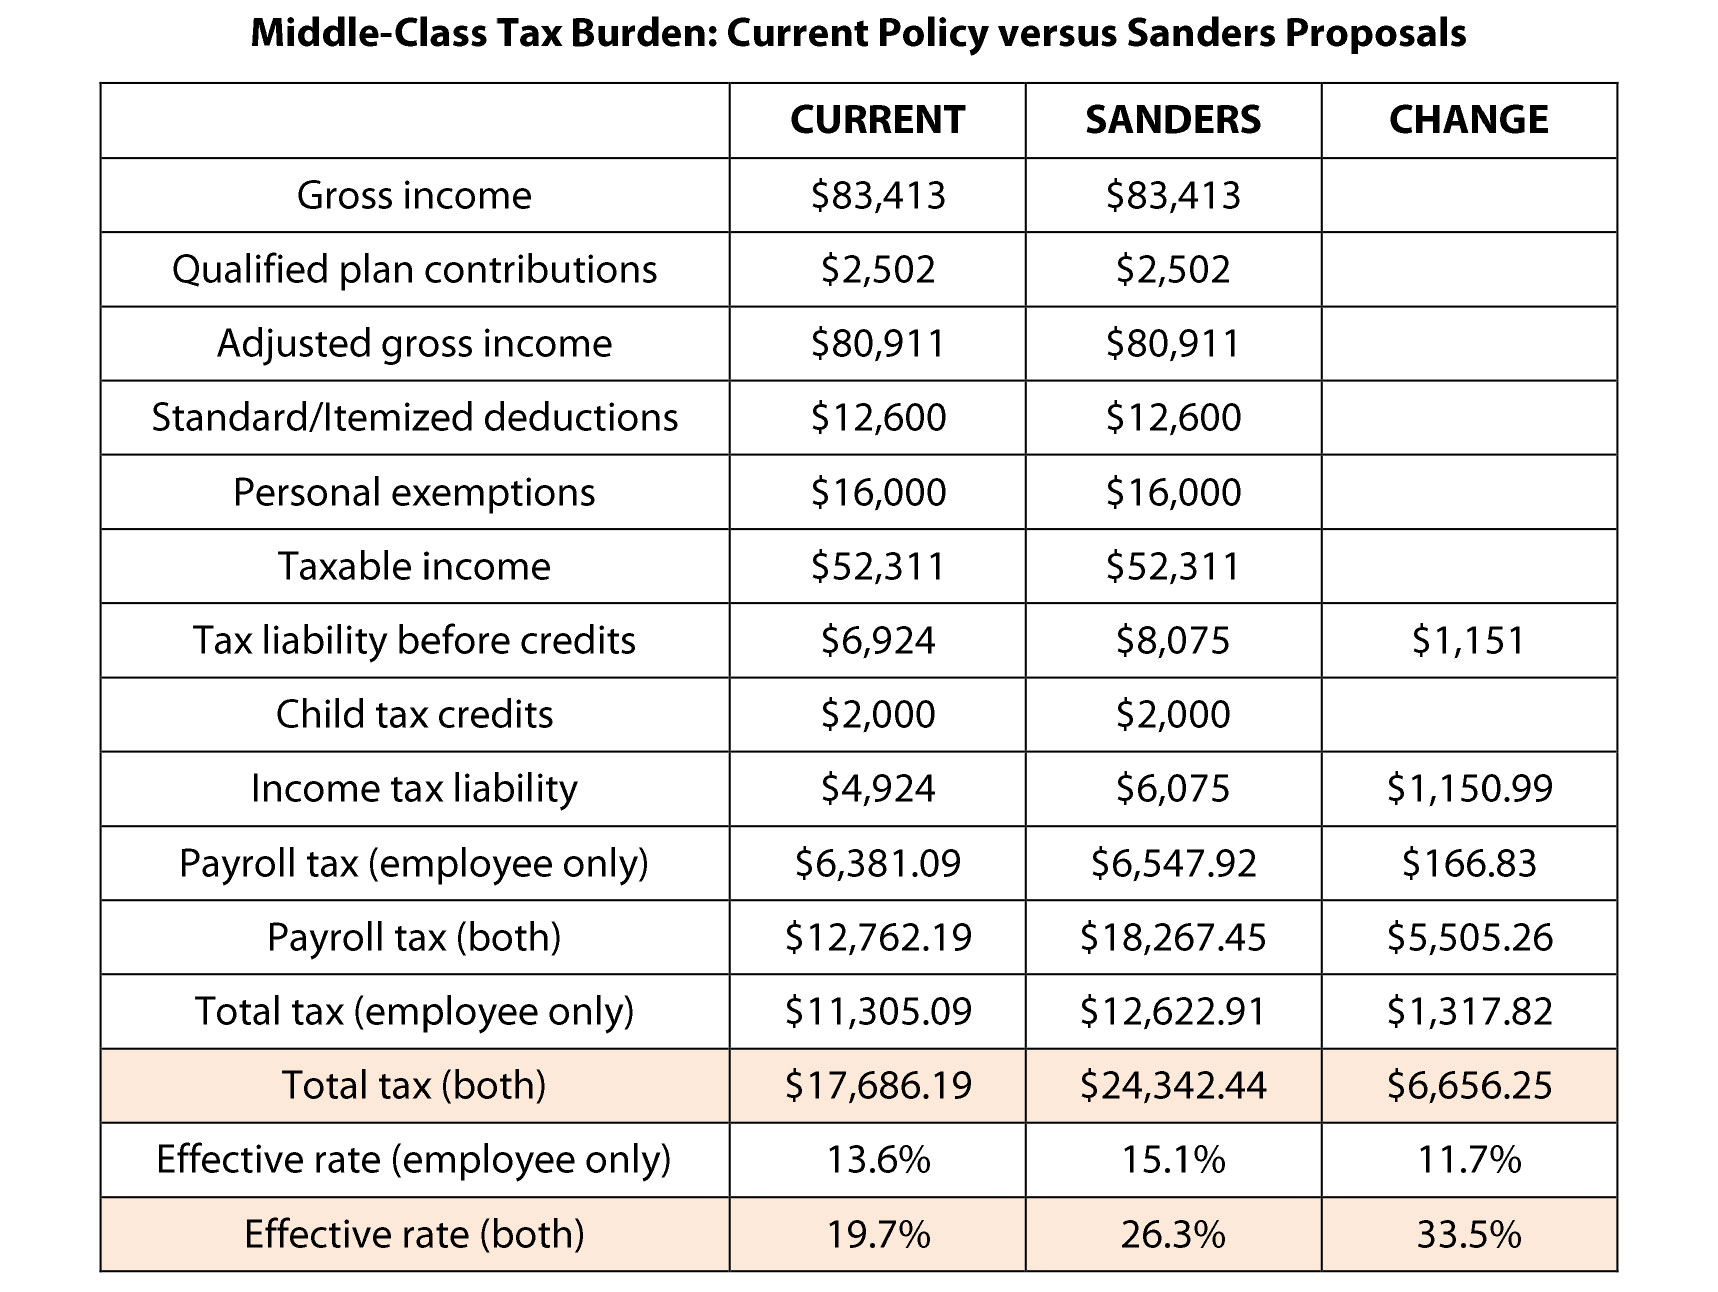 Middle-class Tax Burden: Current Policy versus Sanders Proposals